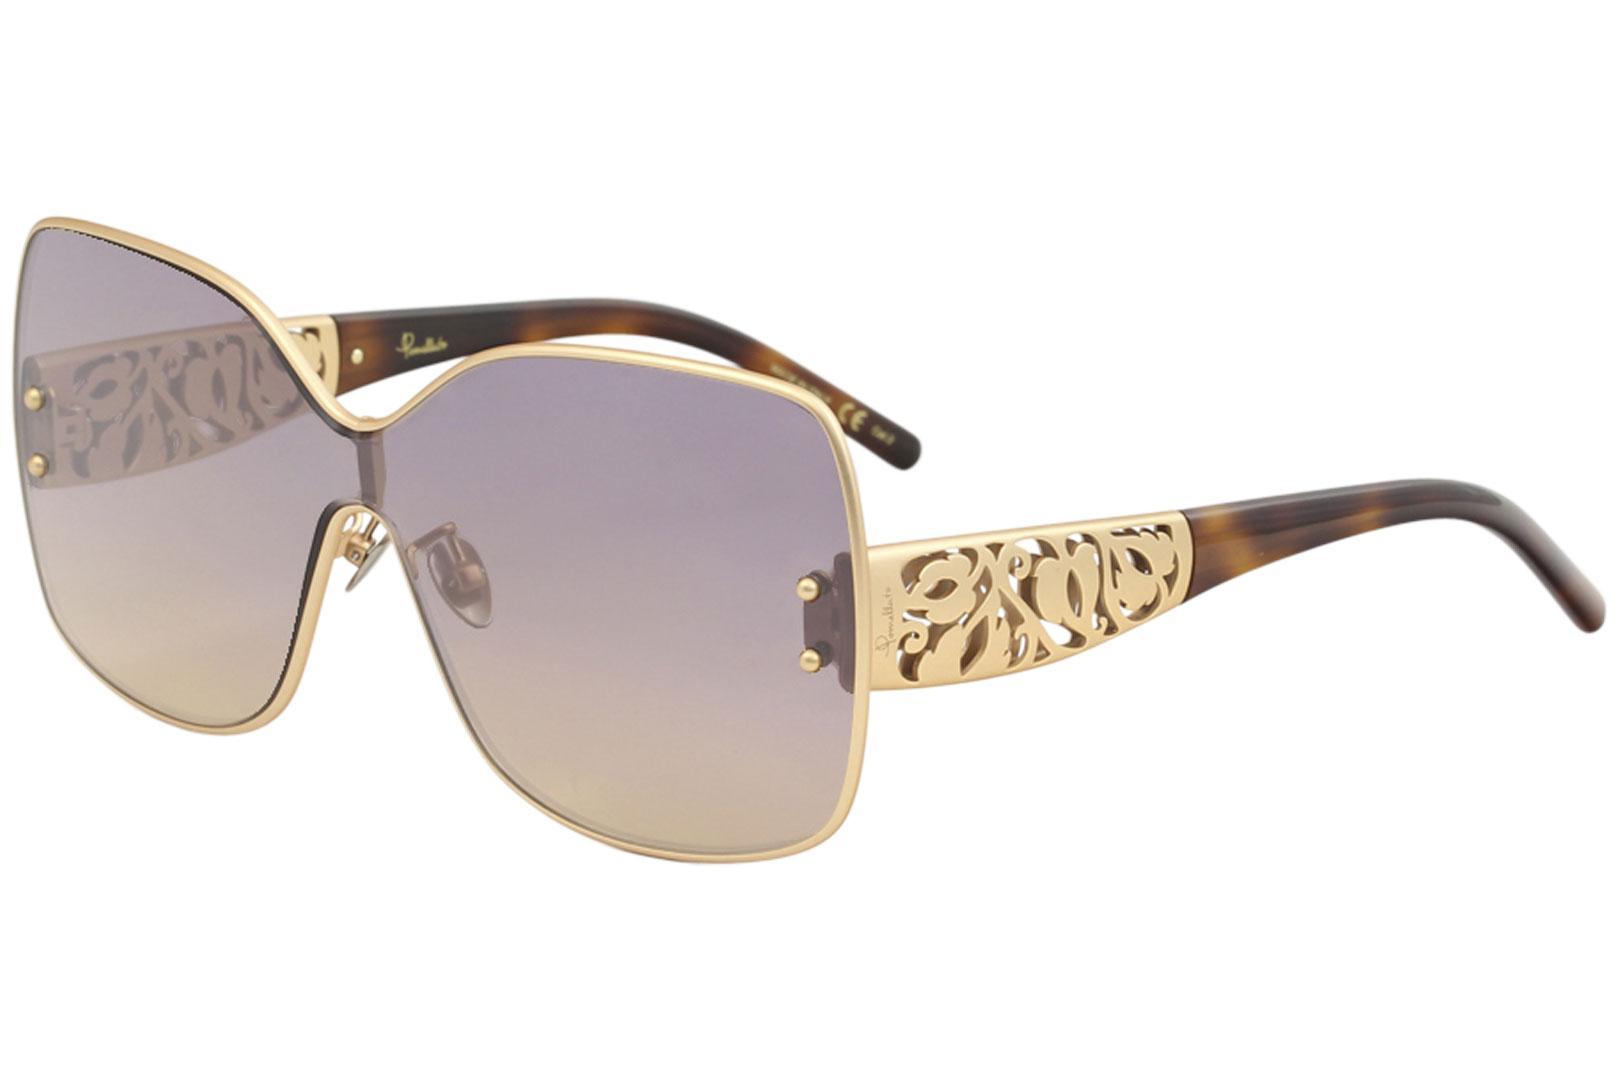 Image of Pomellato Women's PM0044S PM/0044/S Fashion Shield Sunglasses - Rose Gold Havana/Violet/Gold Gradient Bronze   001 - Lens 99 Bridge 0 Temple 145mm